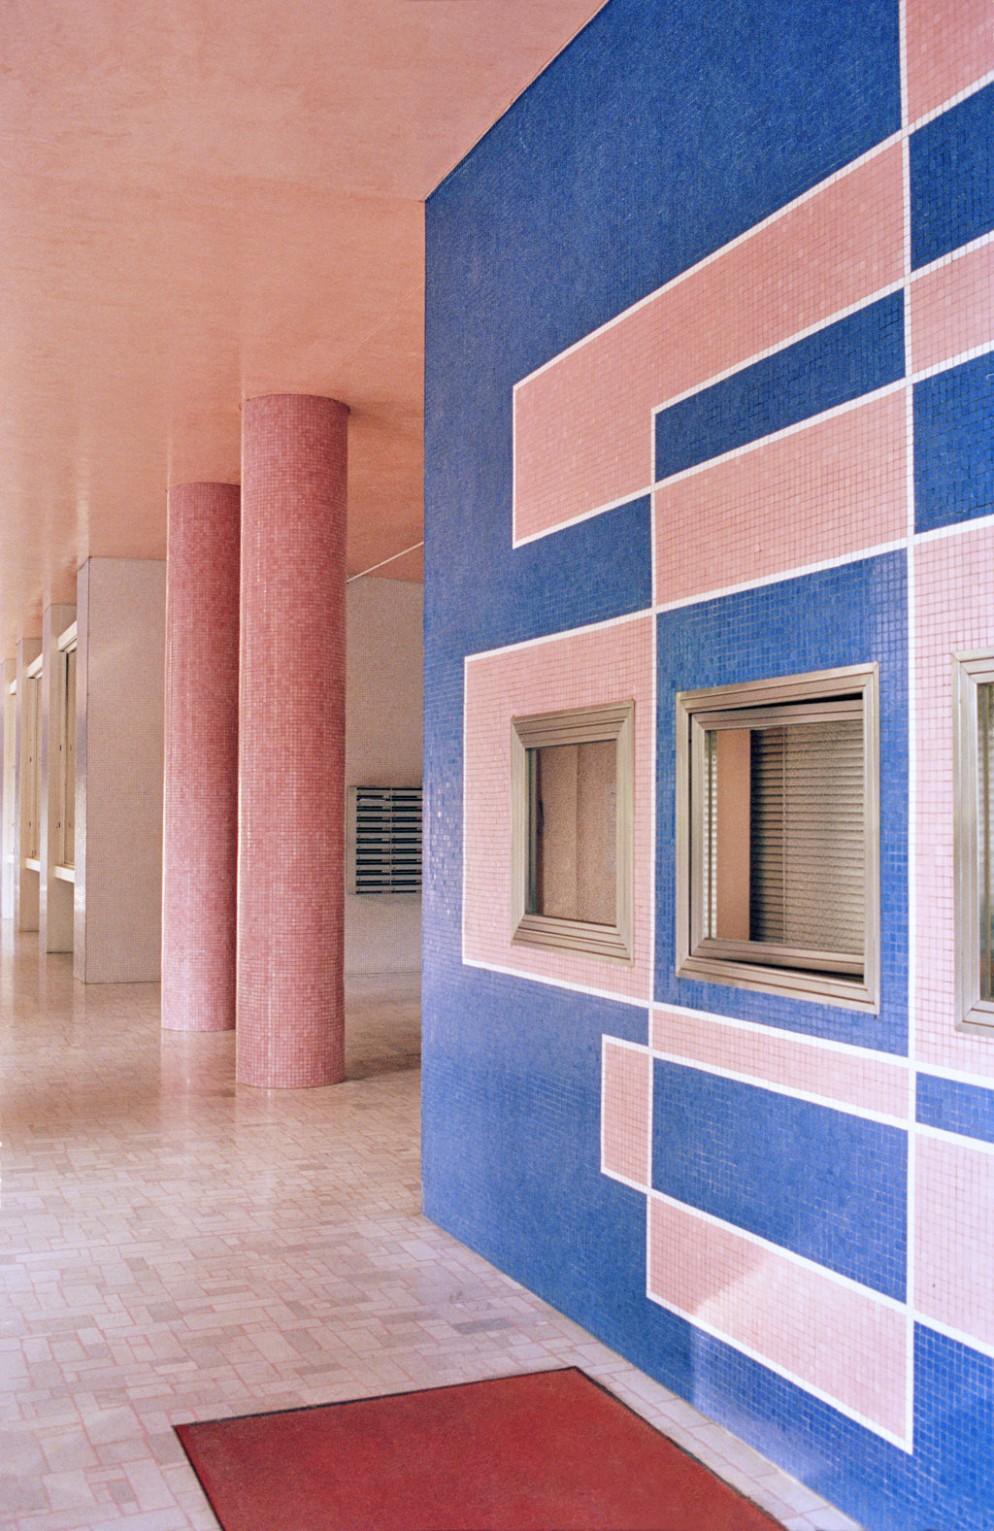 milano-architettura-020 -ph_stefan-giftthaler-livingcorriere